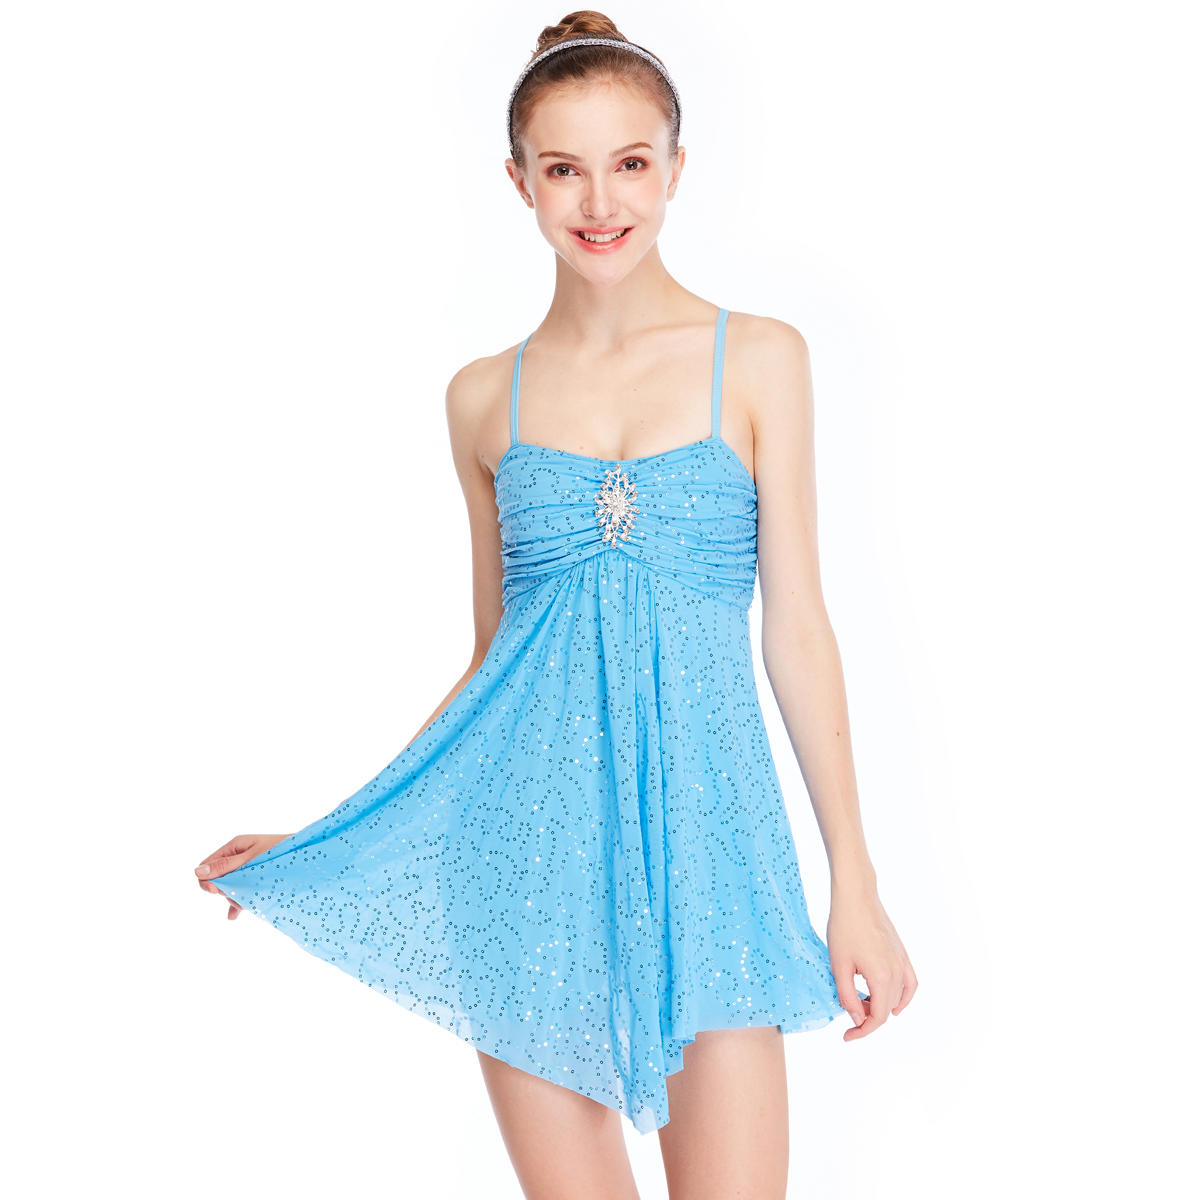 MiDee Luxury Elegant Girl Lyrical Dance Costume Skating Performance Dress